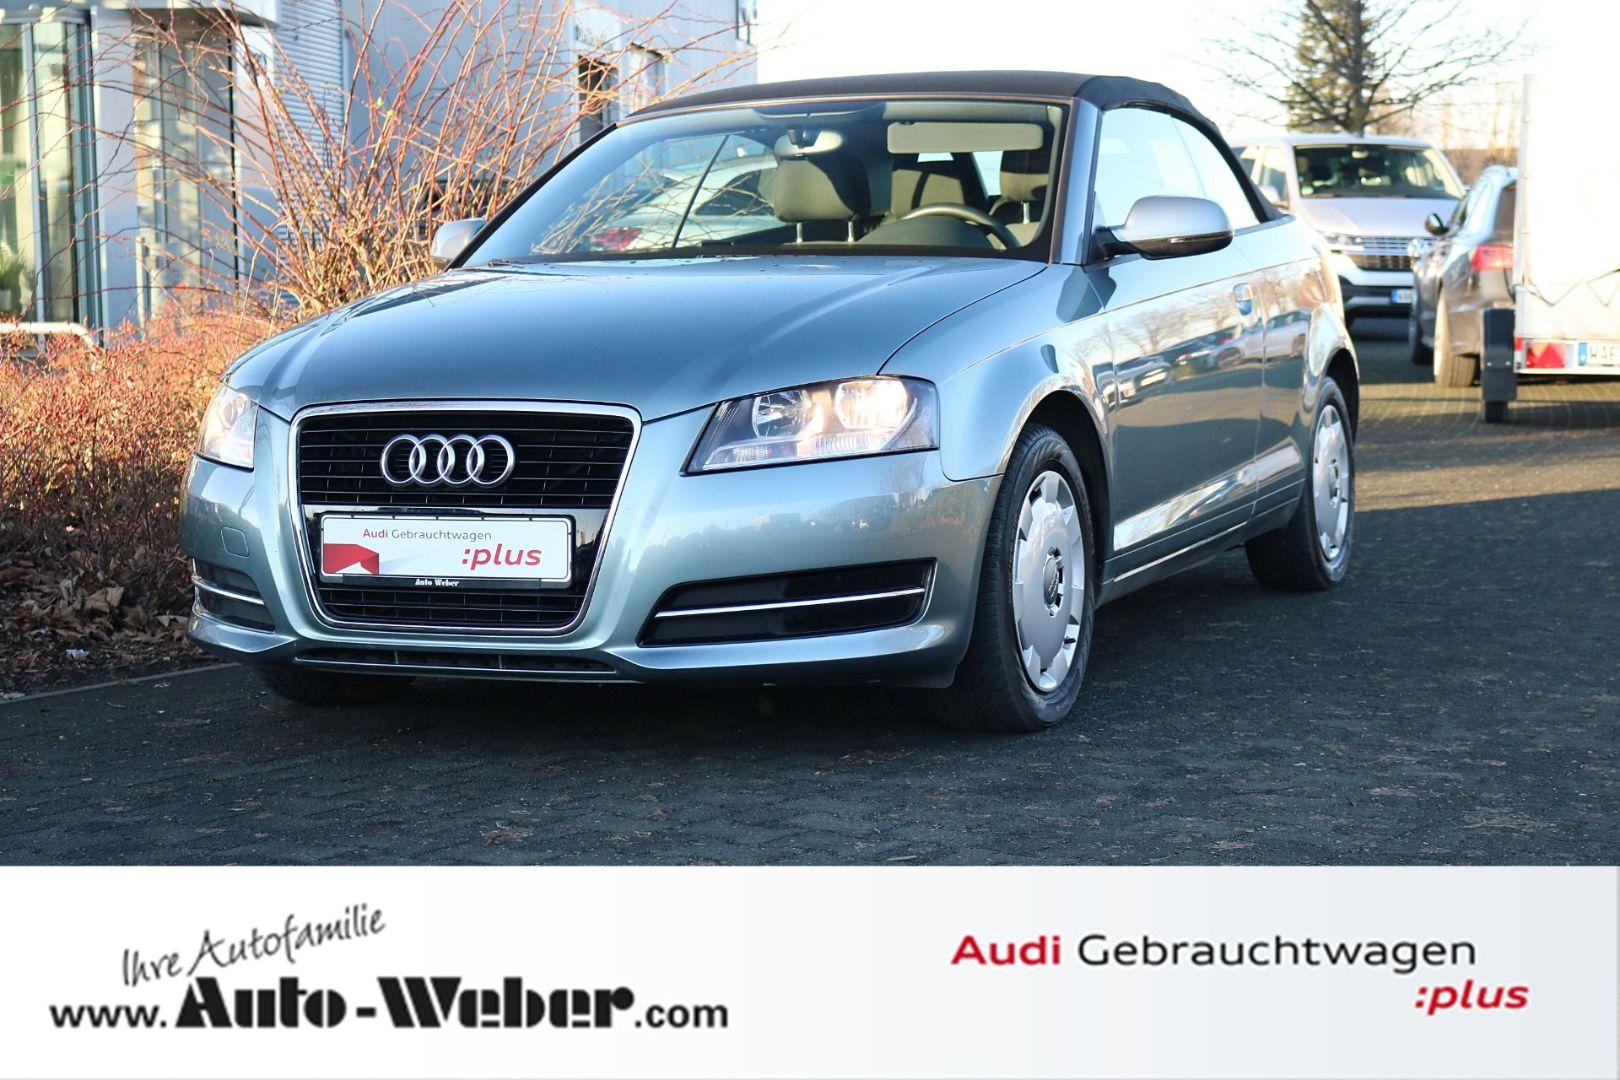 Audi A3 Cabriolet Attraction 1.2TFSI, Jahr 2012, petrol